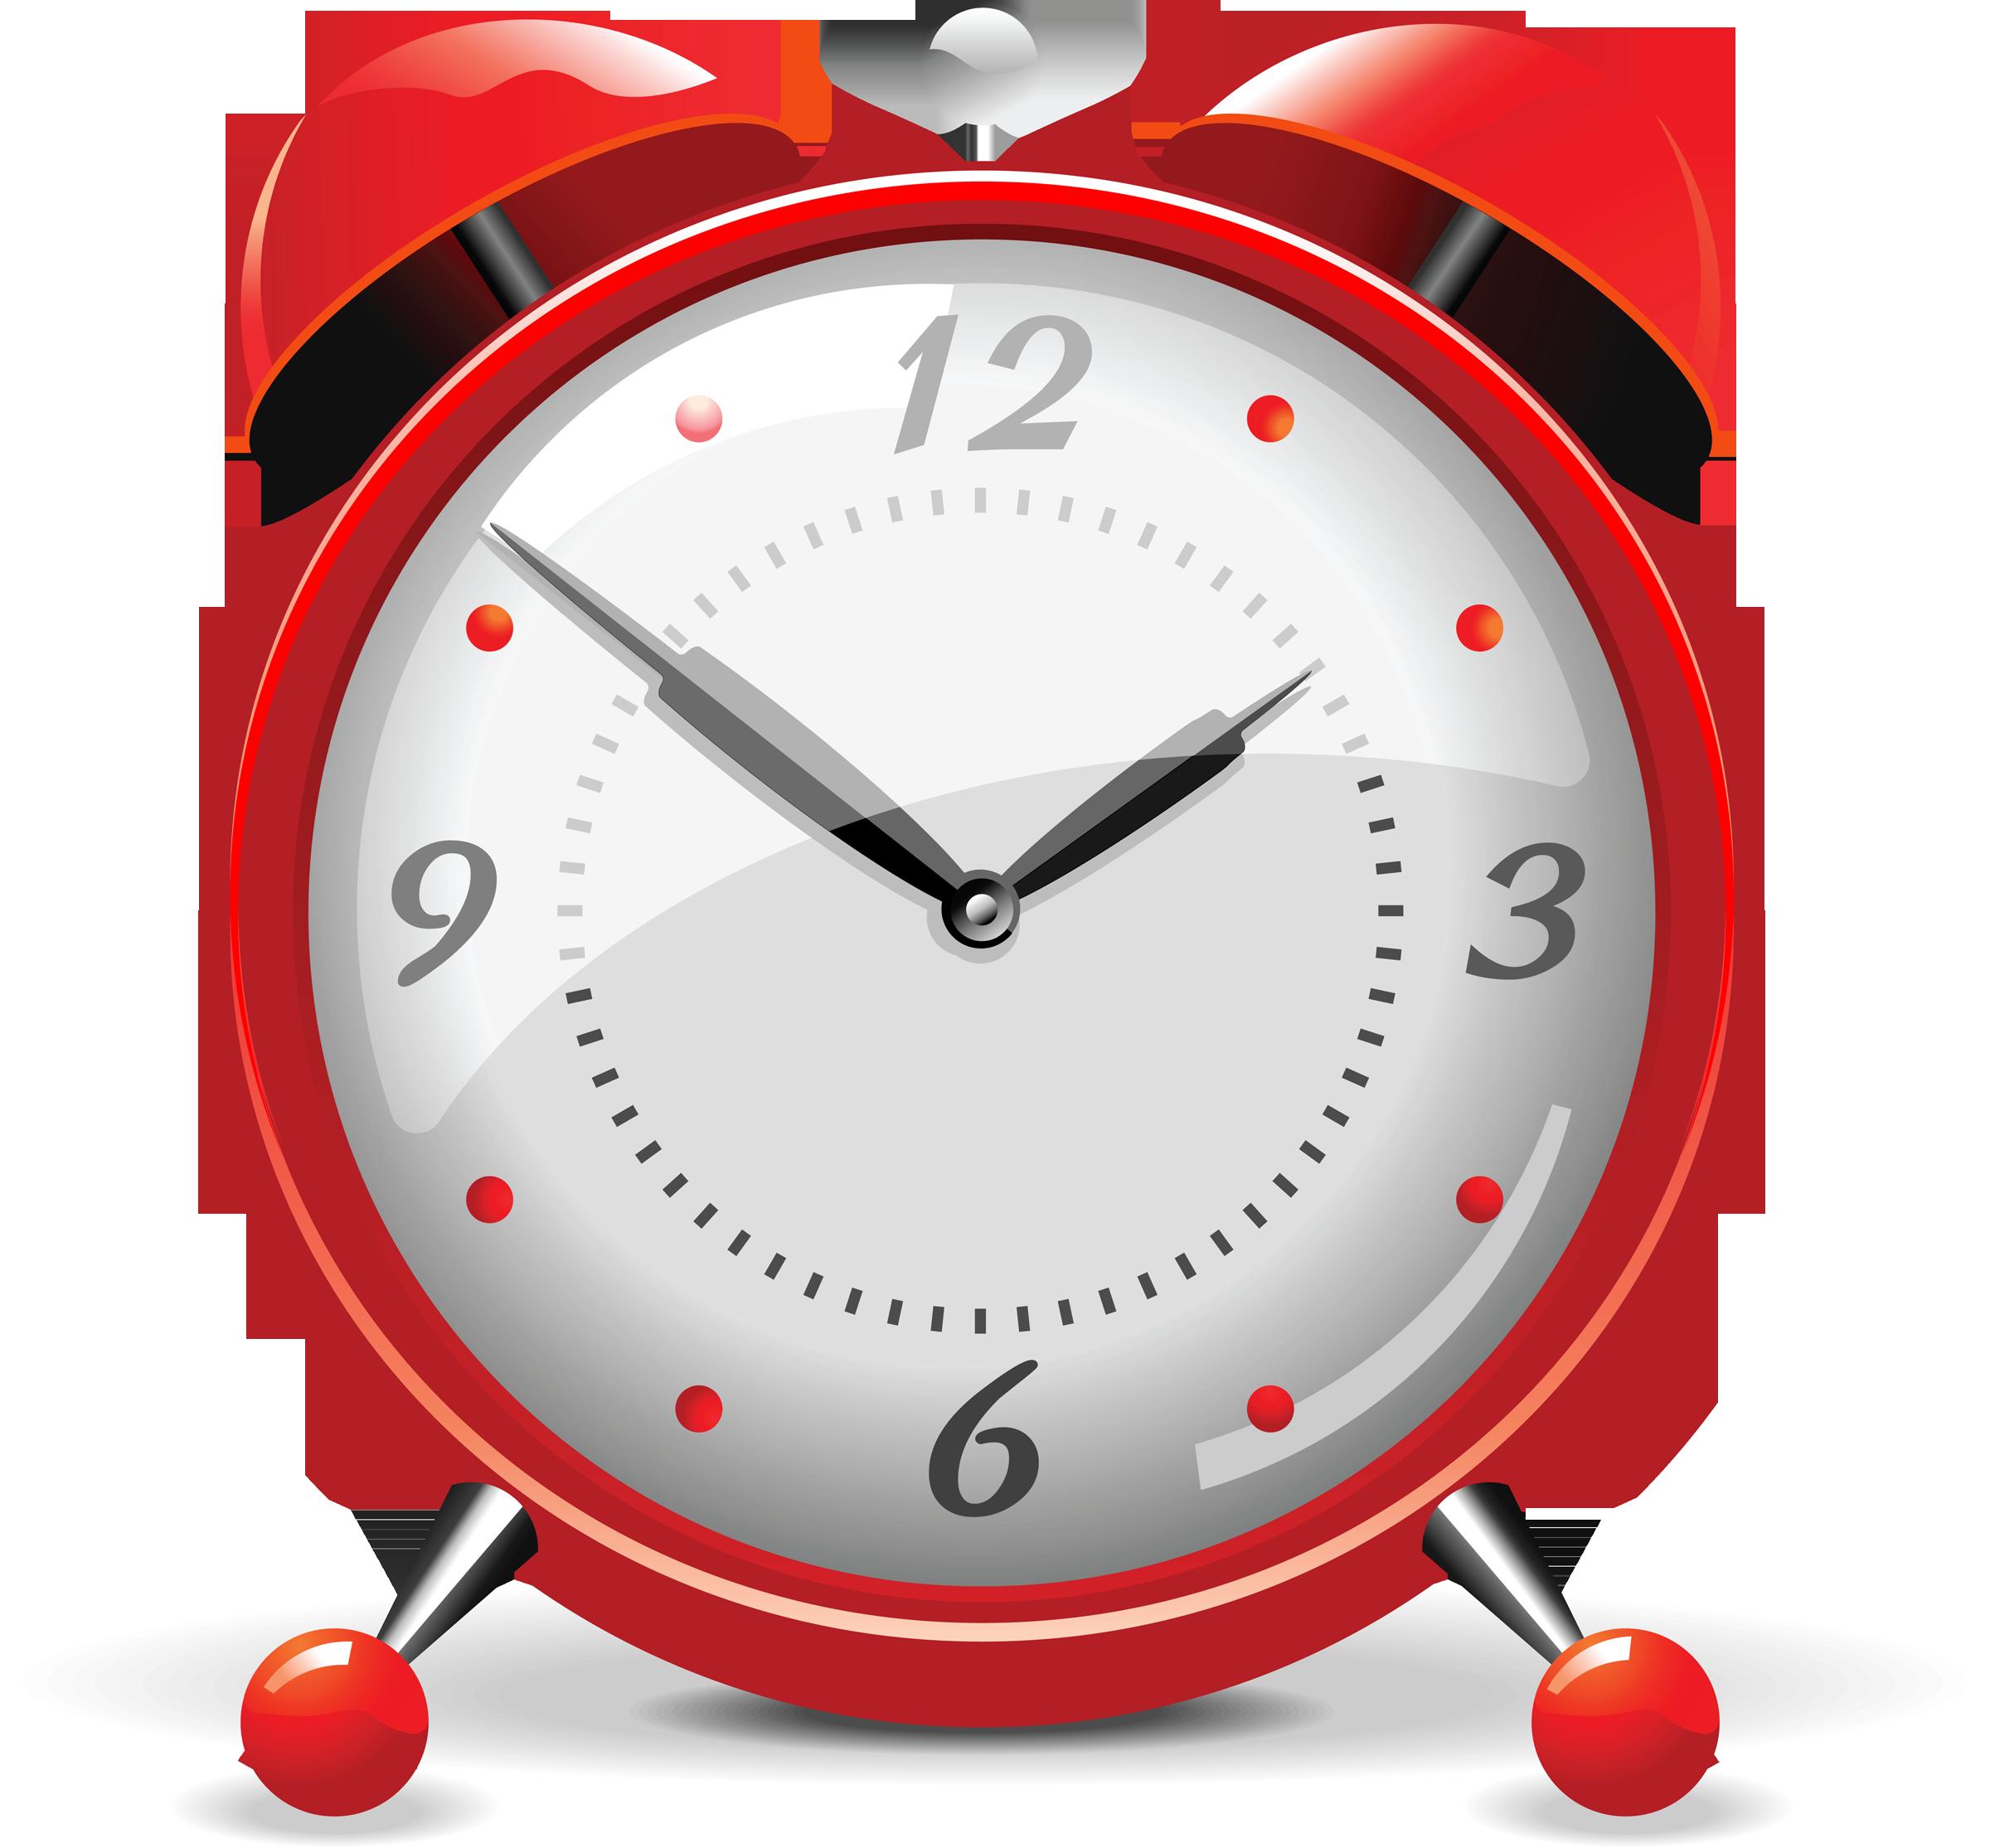 clock clipart transparent 15141 transparentpng alarm clock clipart black and white alarm clock clip art free images